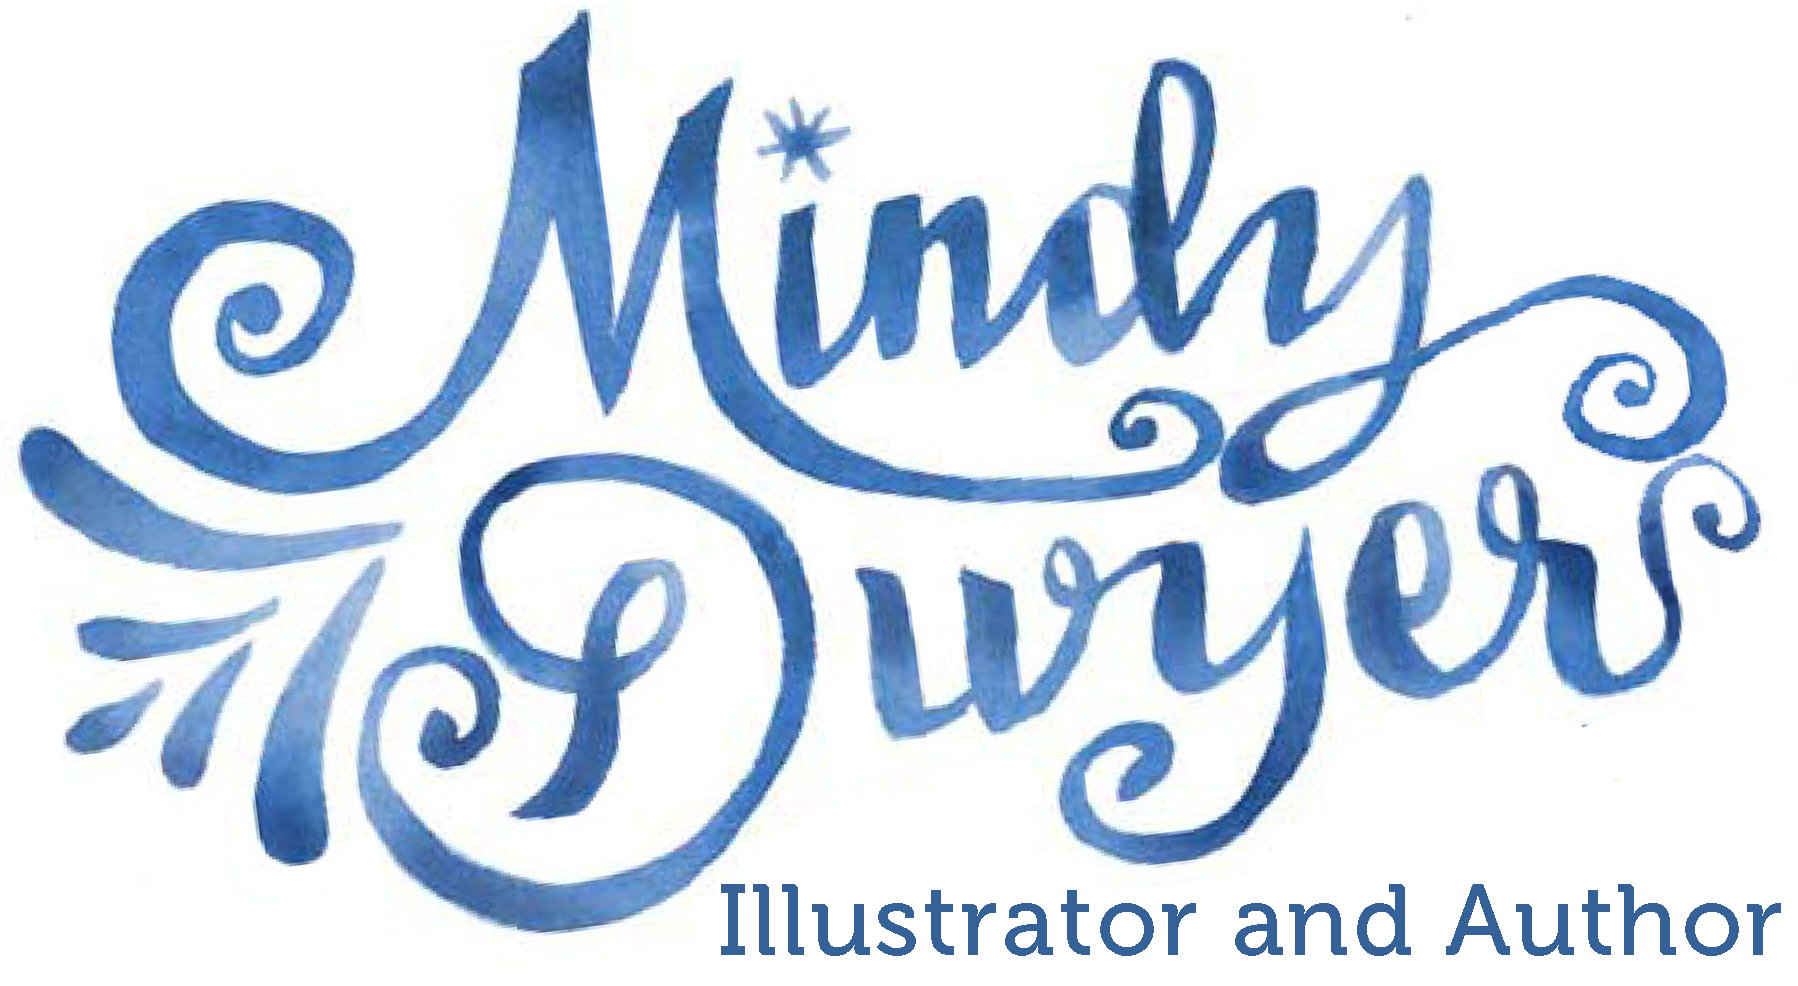 mindydwyer.com